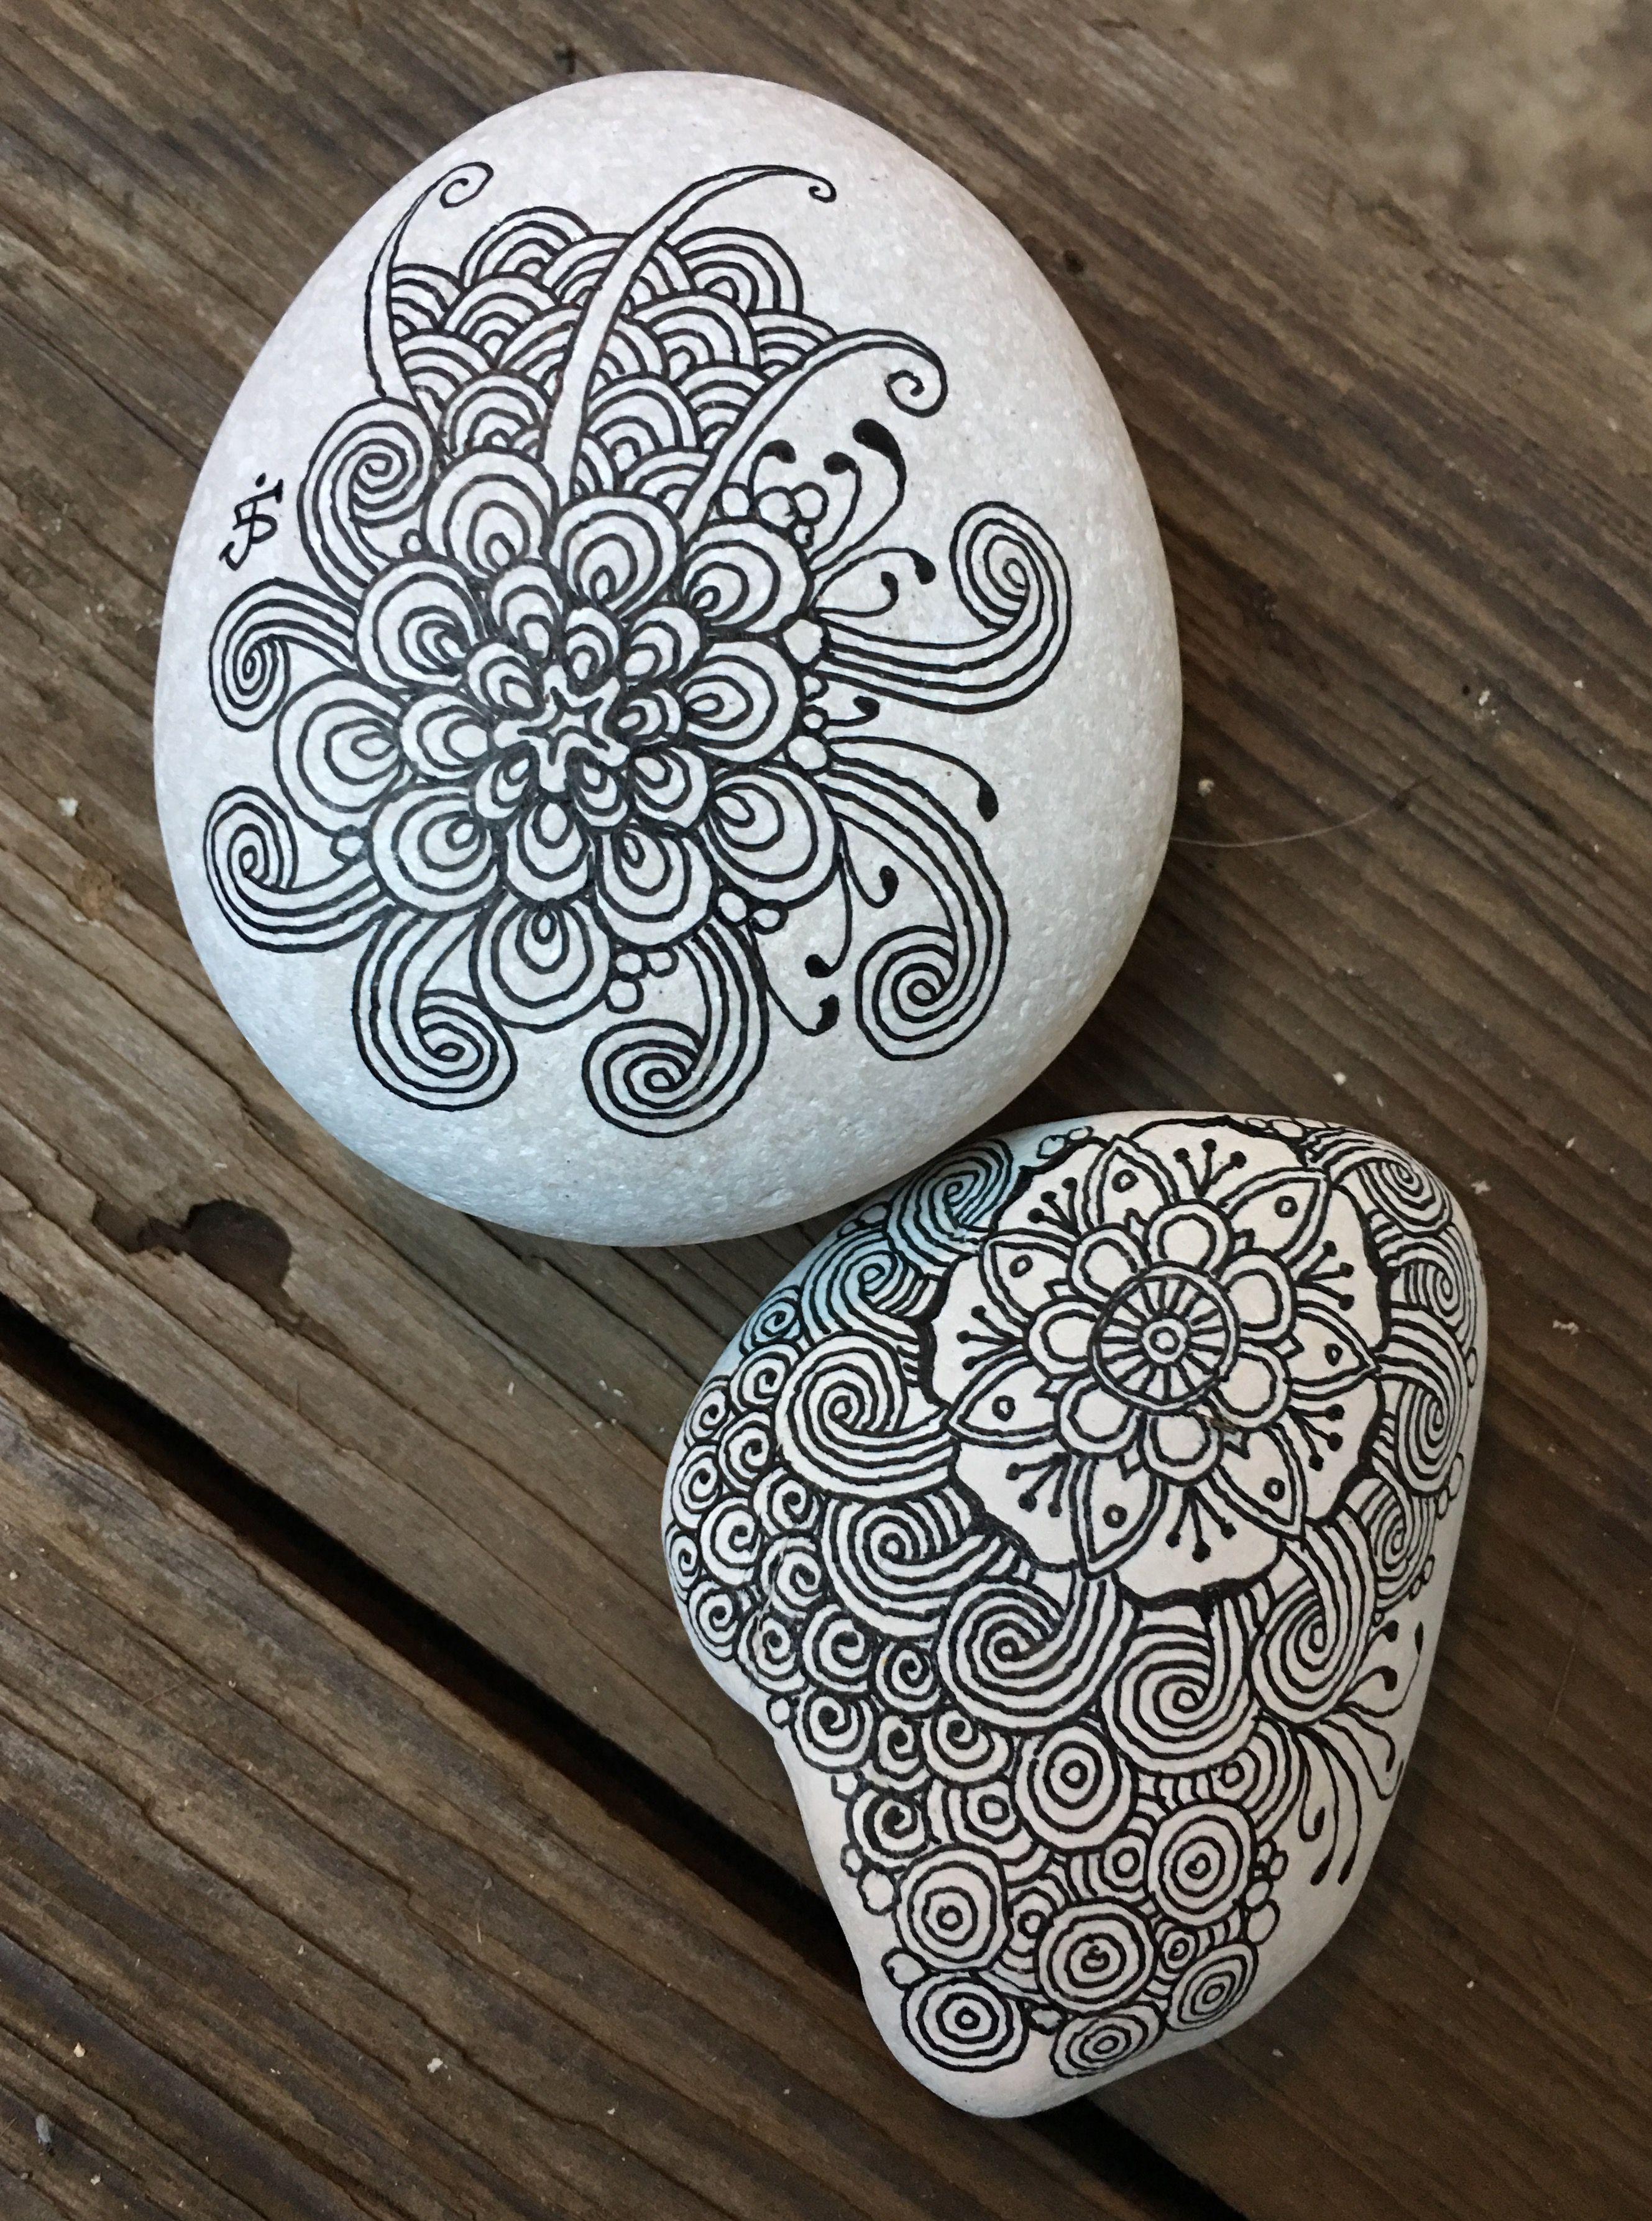 fb razrocks zentangle zia stonepainting. Black Bedroom Furniture Sets. Home Design Ideas